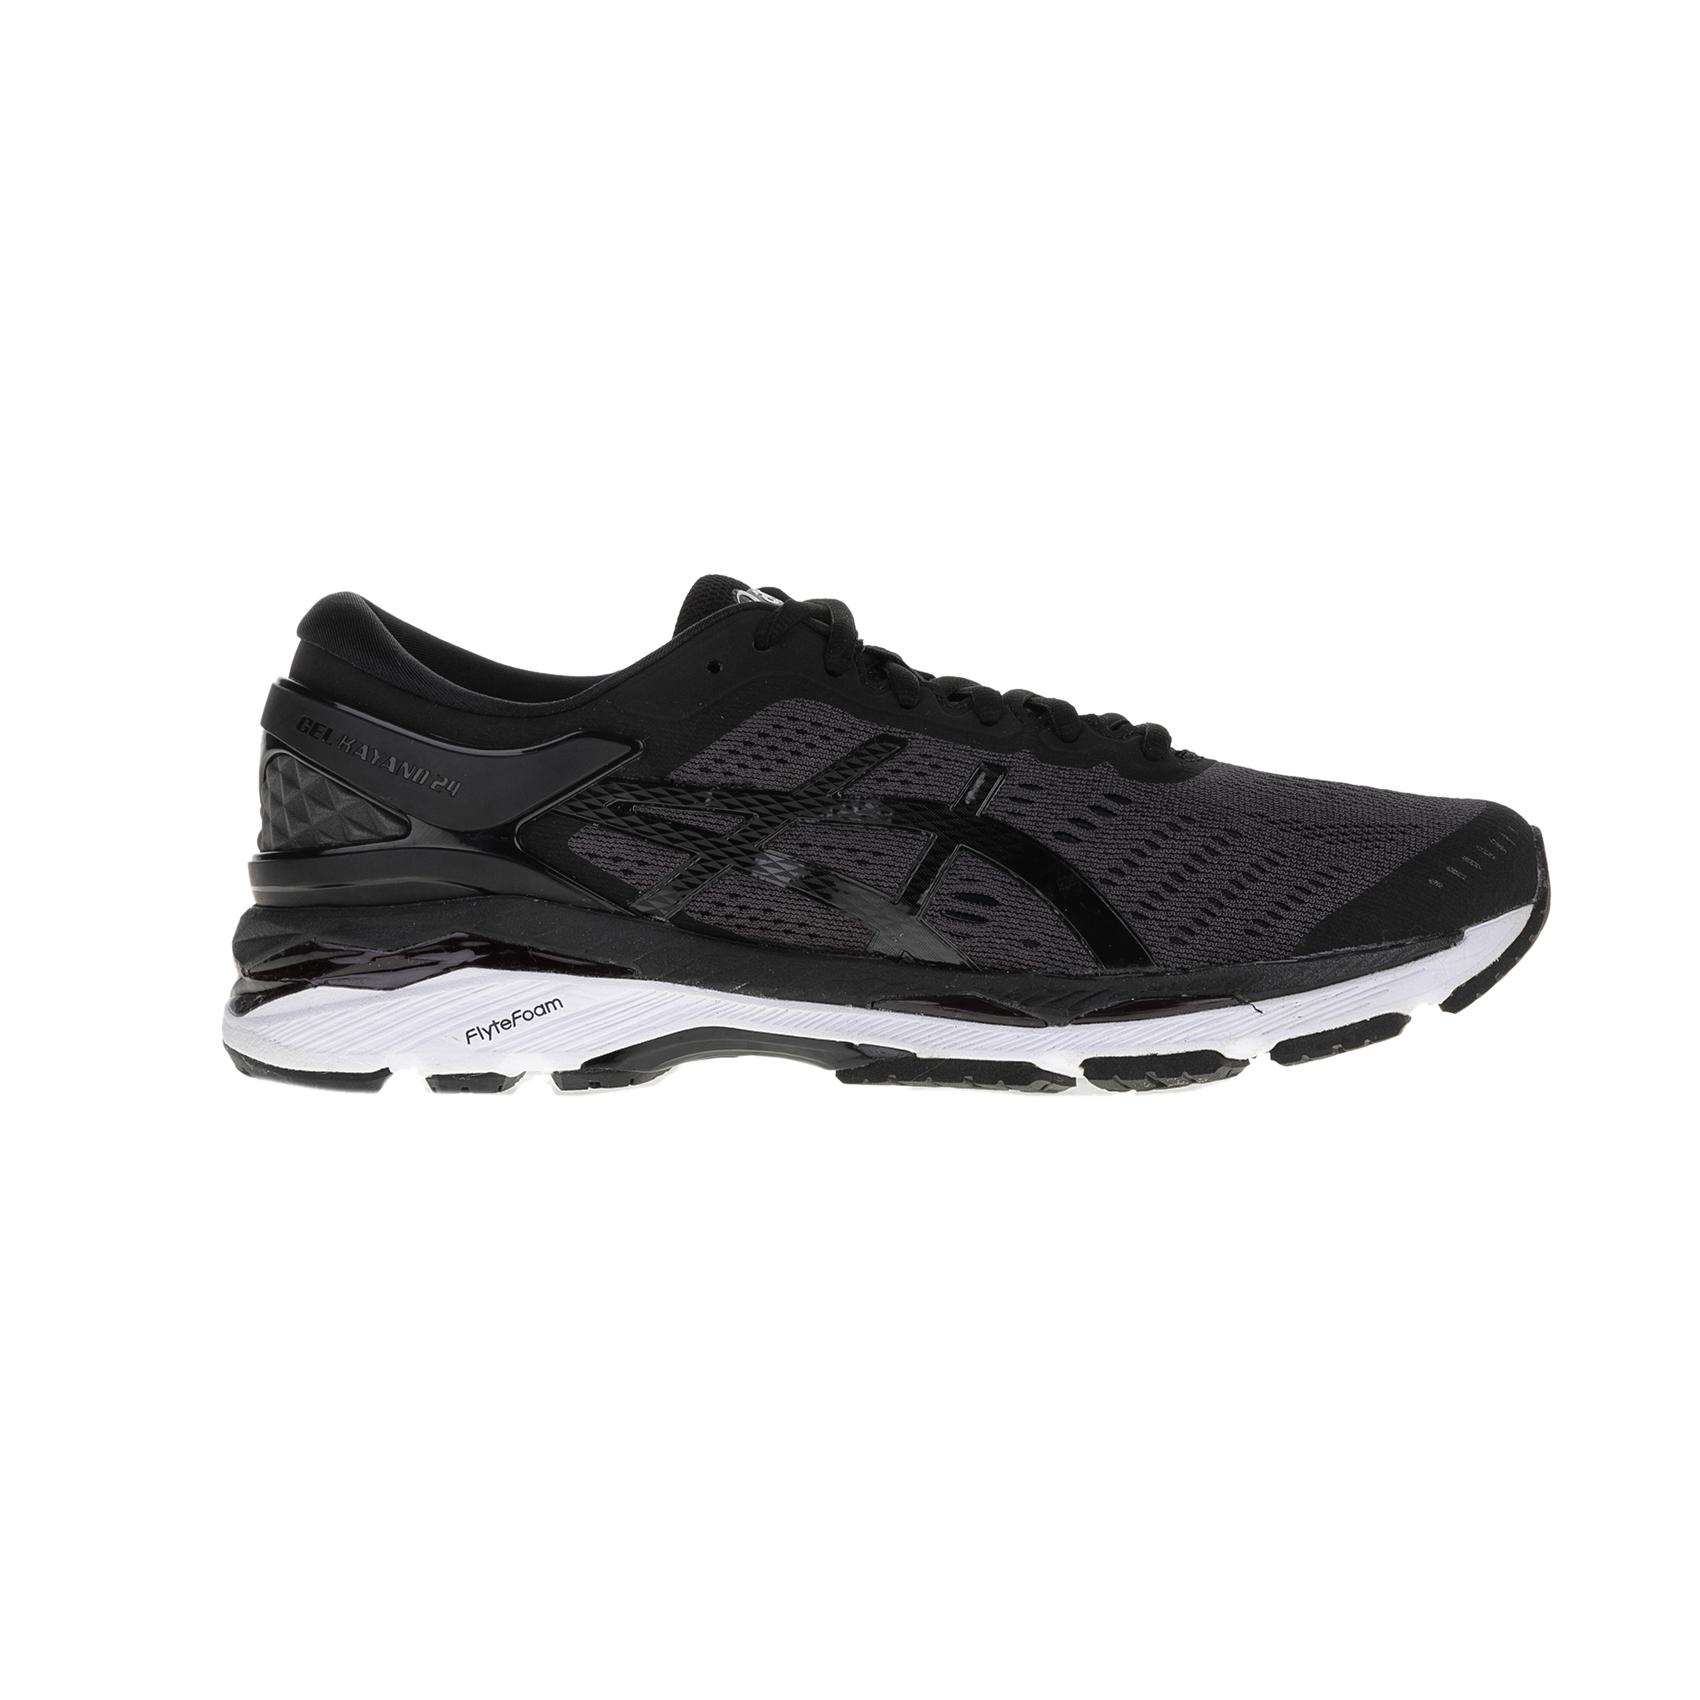 ASICS - Ανδρικά αθλητικά παπούτσια ASICS GEL-KAYANO 24 μαύρα ανδρικά παπούτσια αθλητικά running